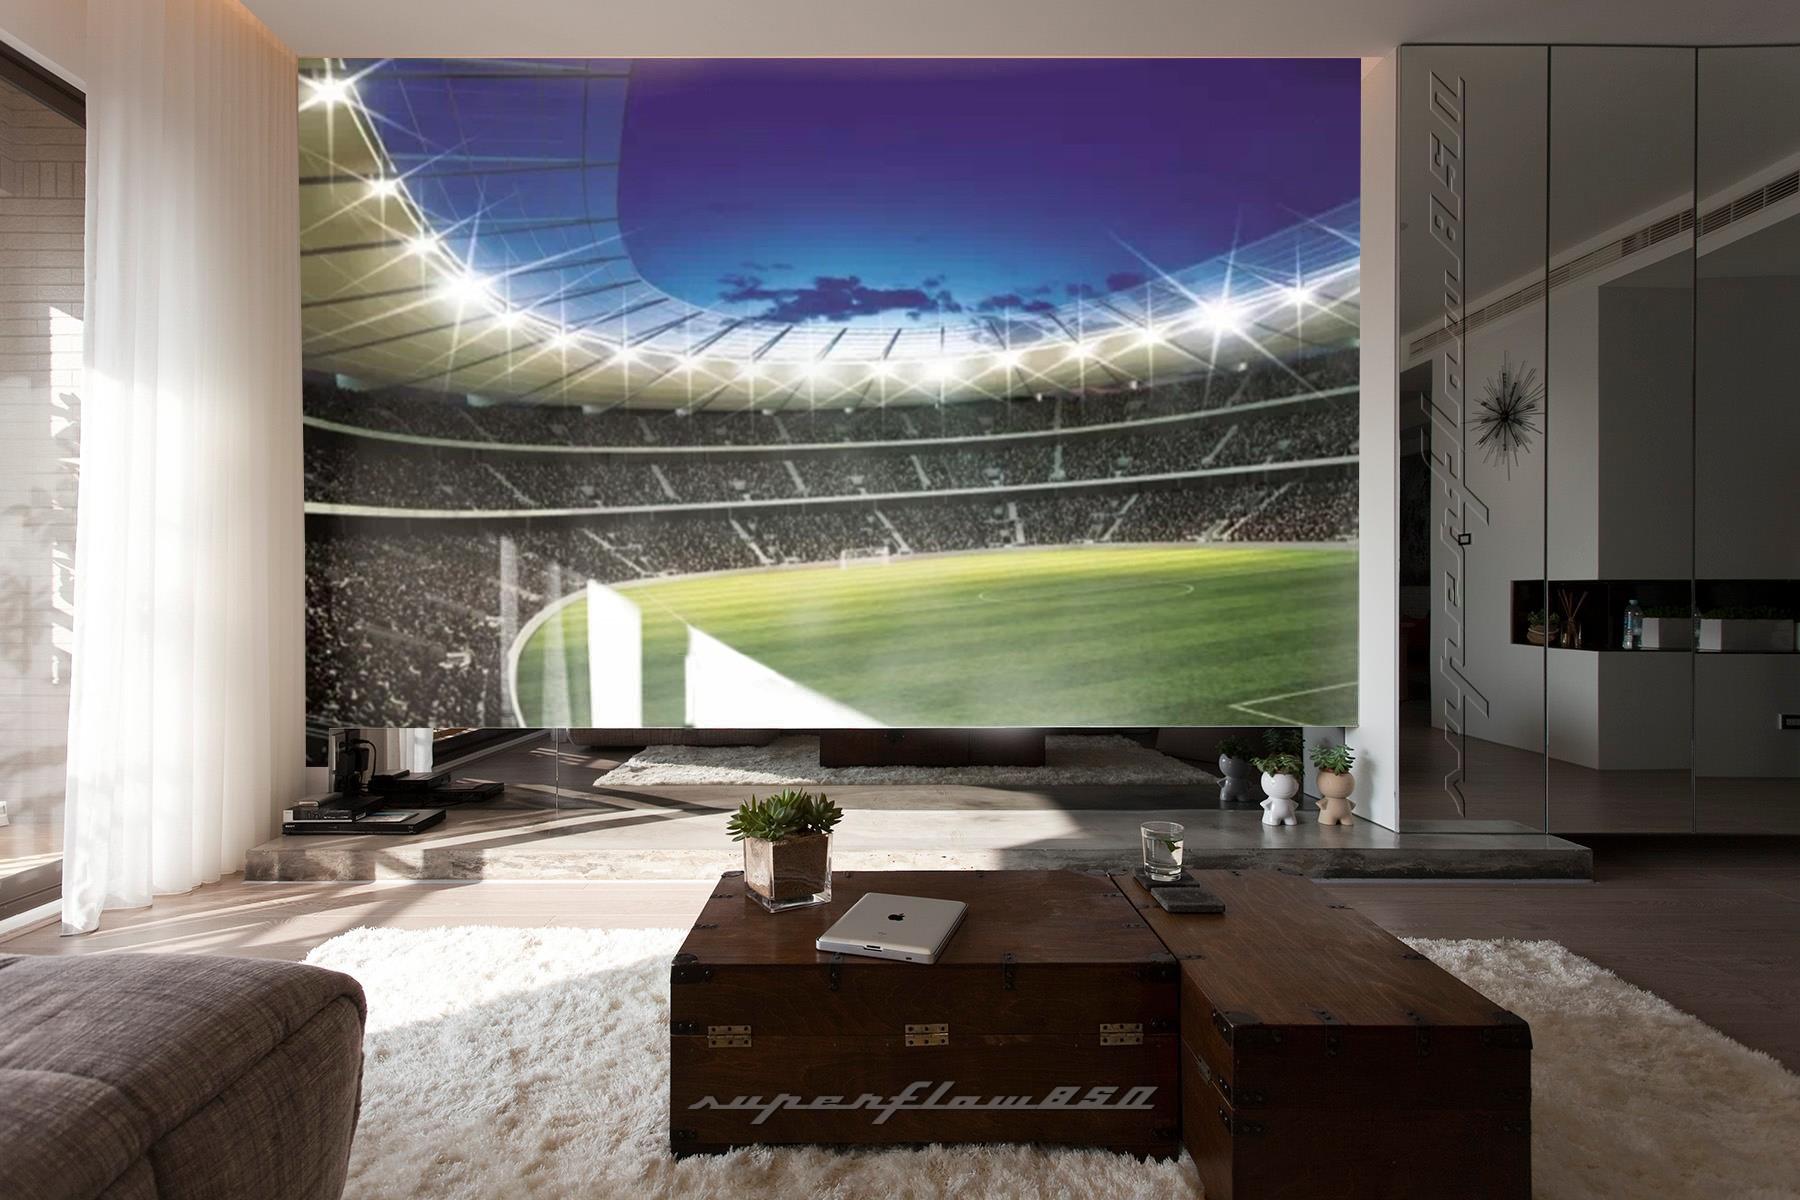 Football Stadium 2 Wallpaper Mural: Football Stadium Photo Wallpaper Wall Mural 323 P4